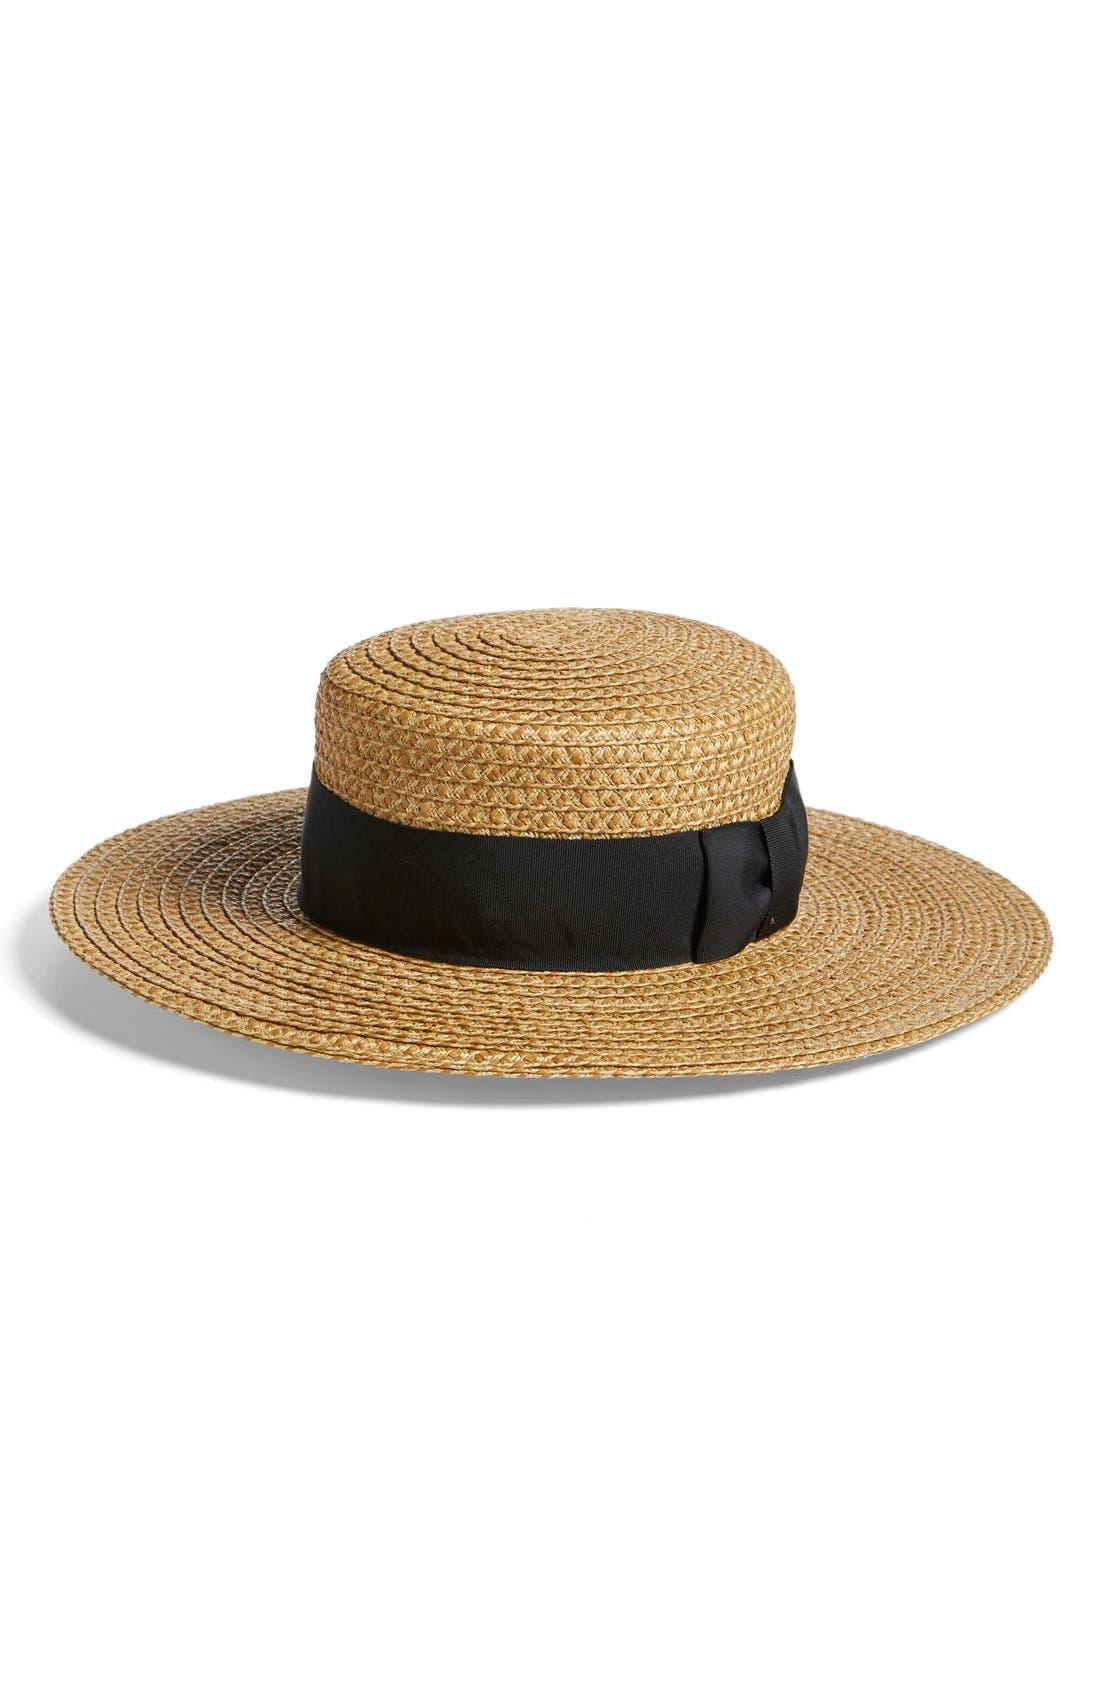 Eric Javits 'Gondolier' Boater Hat